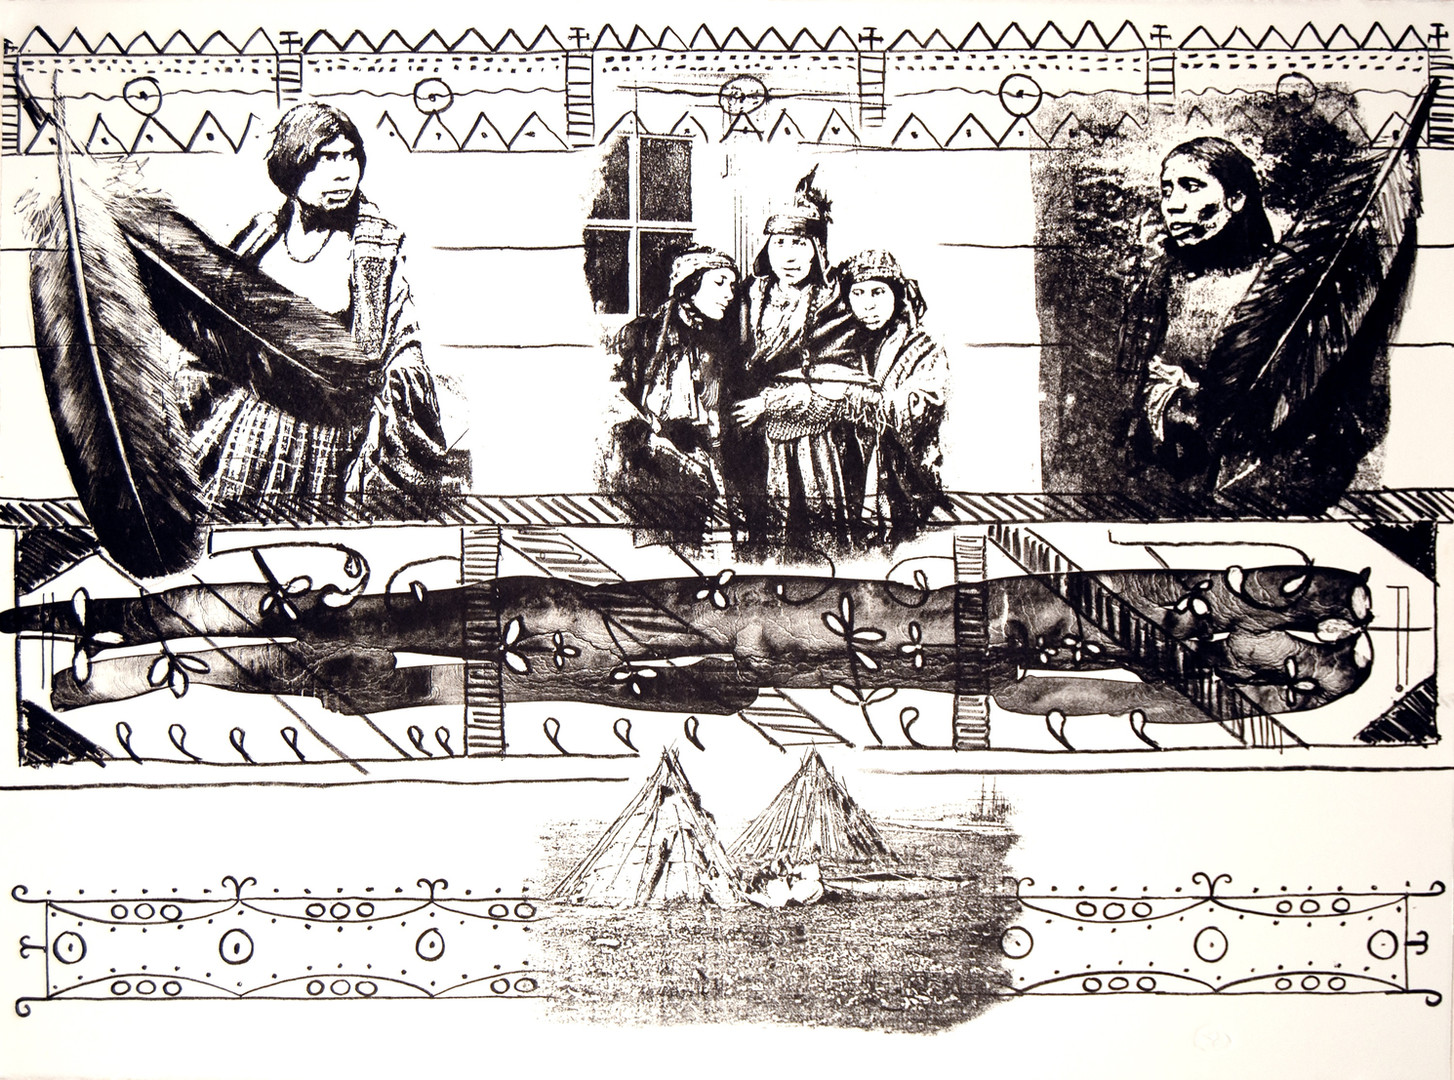 Mi'kmaq Women of The French Shore. 1996